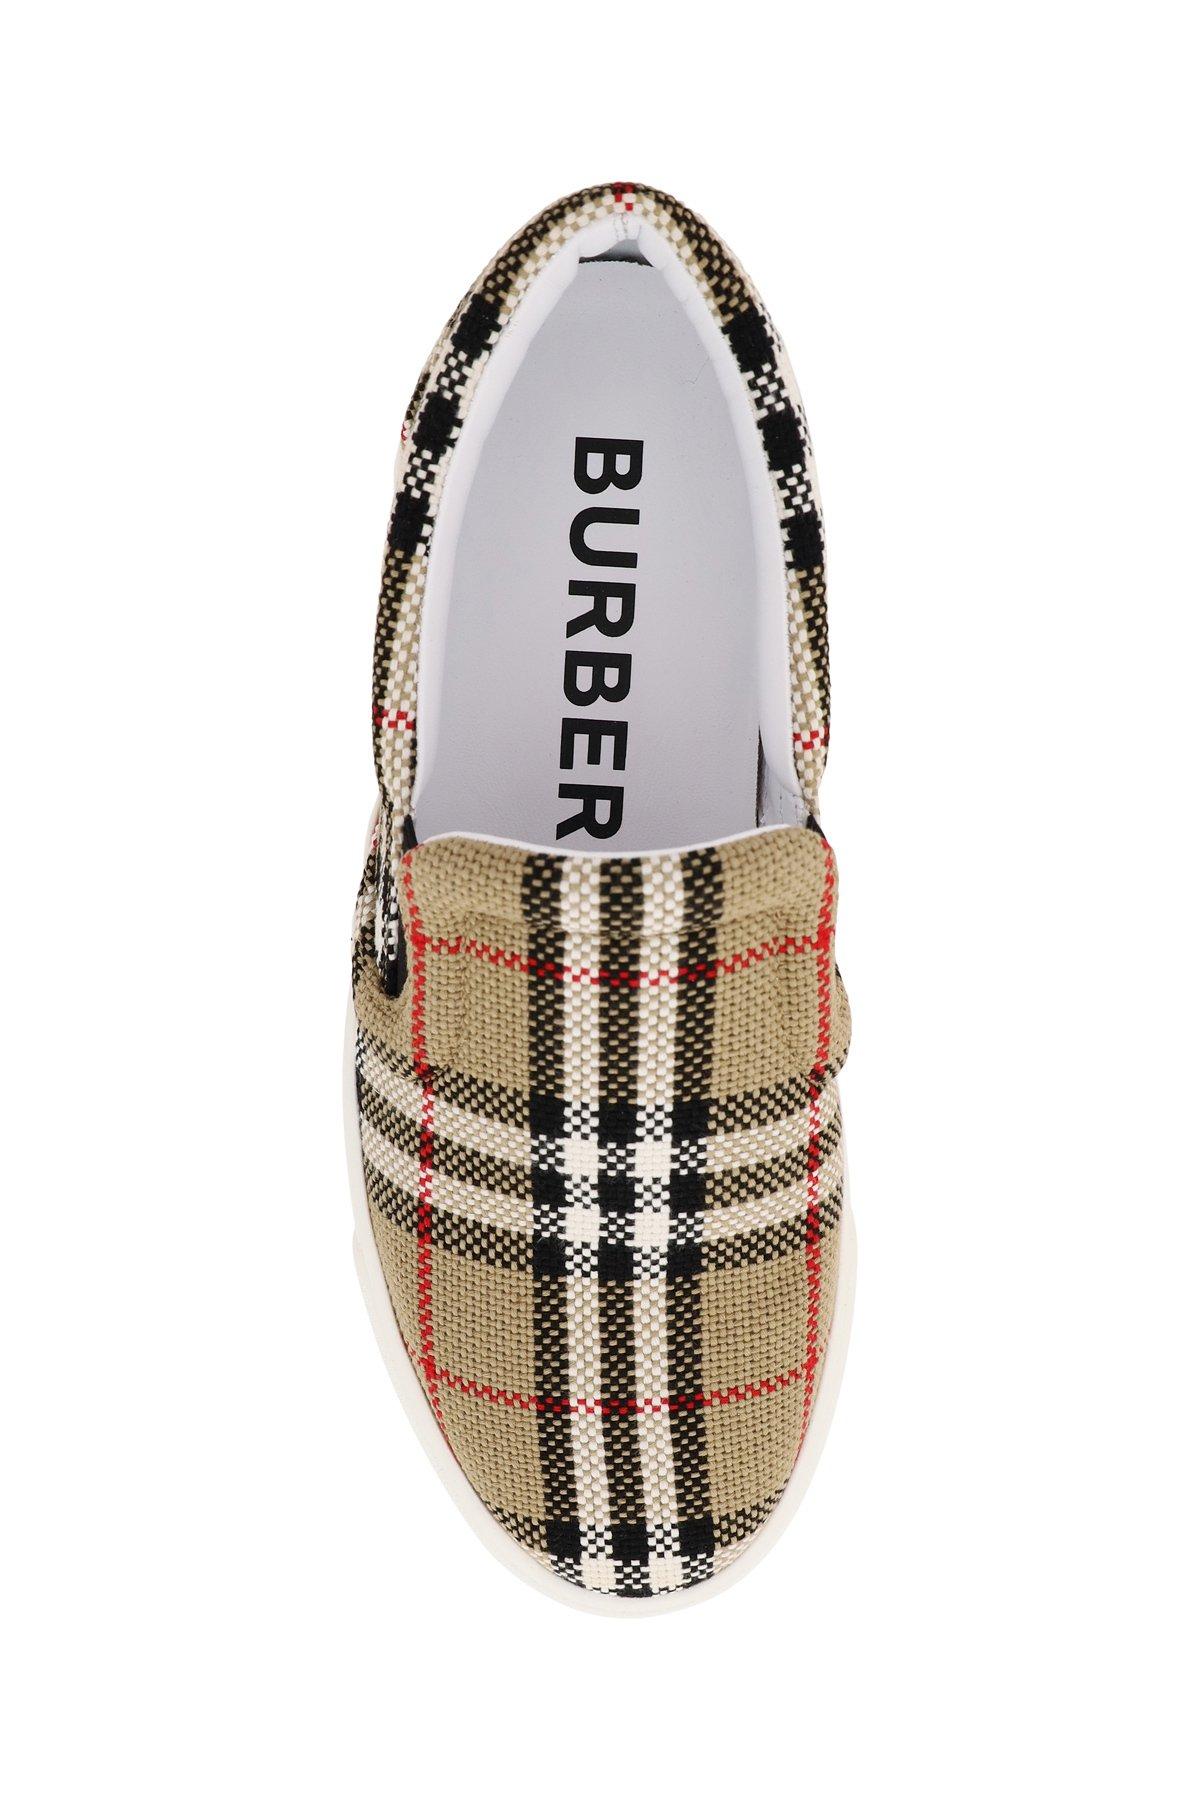 Burberry sneakers slip on thompson